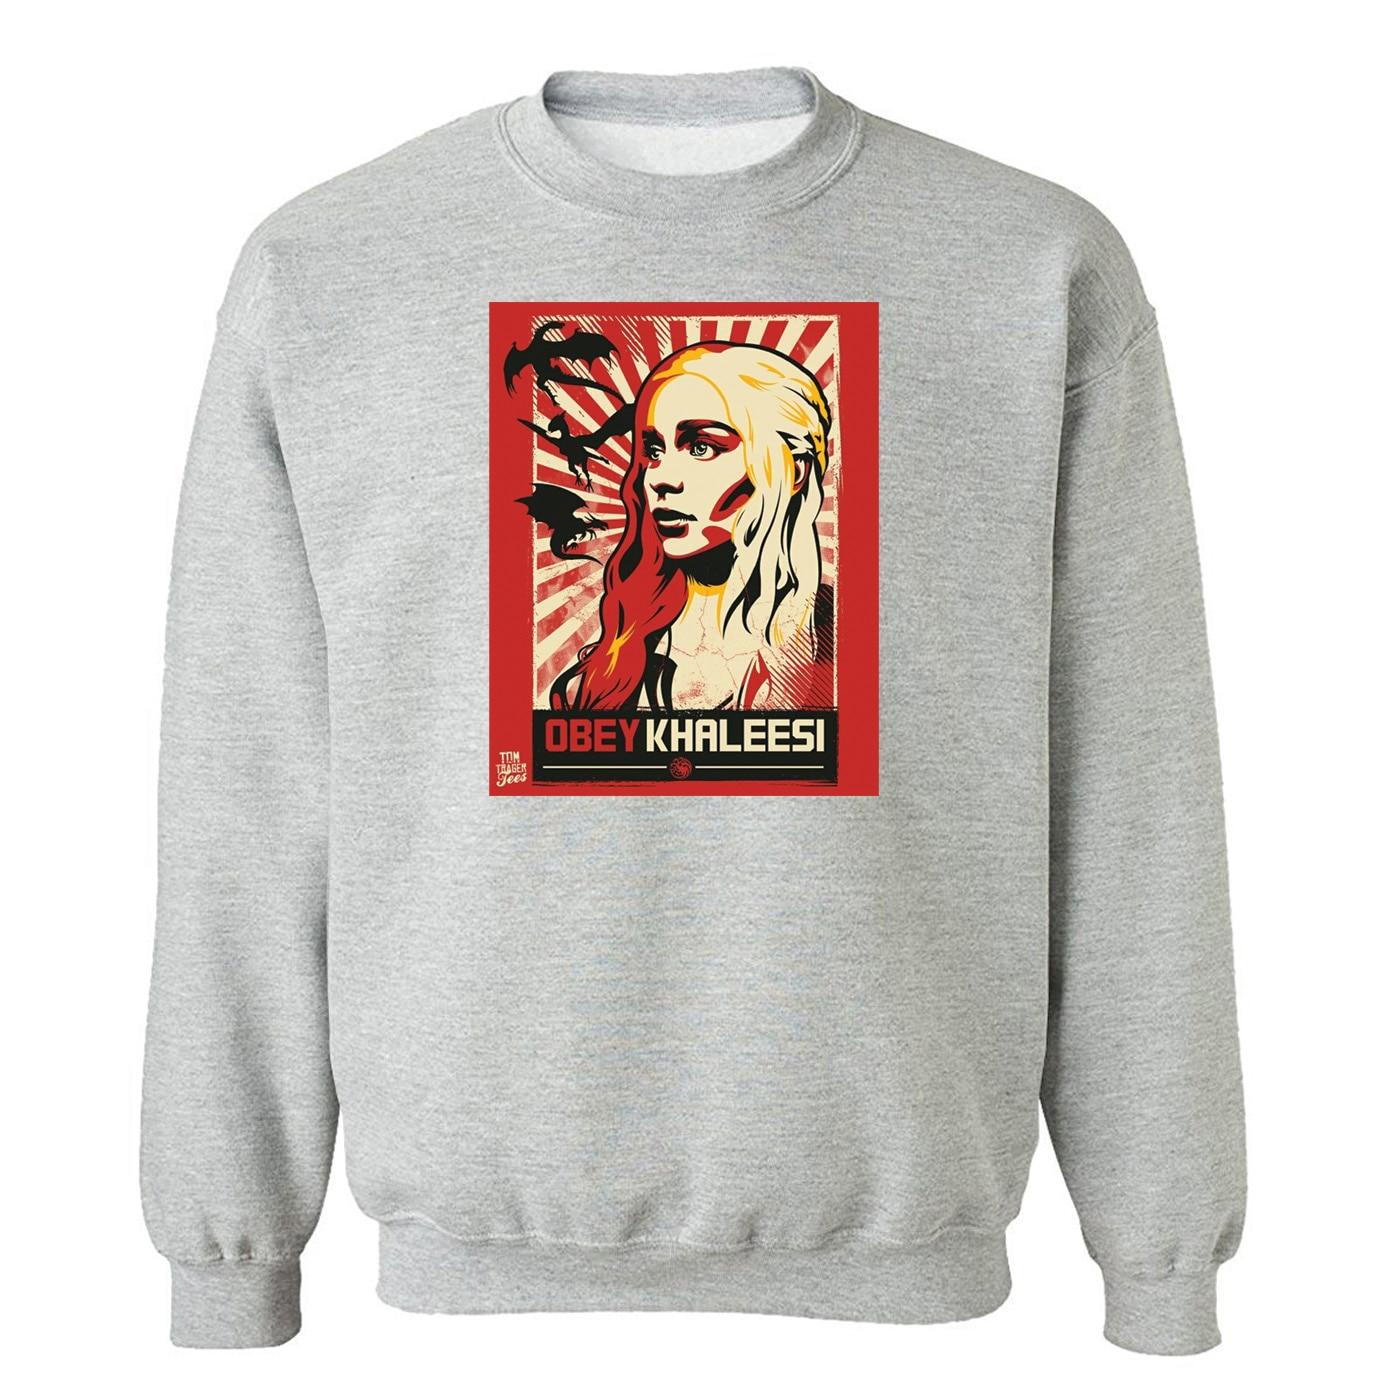 Autumn Men Hoodies Sweatshirts Hip Hop Game Of Rights Daenerys Targaryen Male Streetwear Fashion Harajuku Sweatshirt Man Hoodie